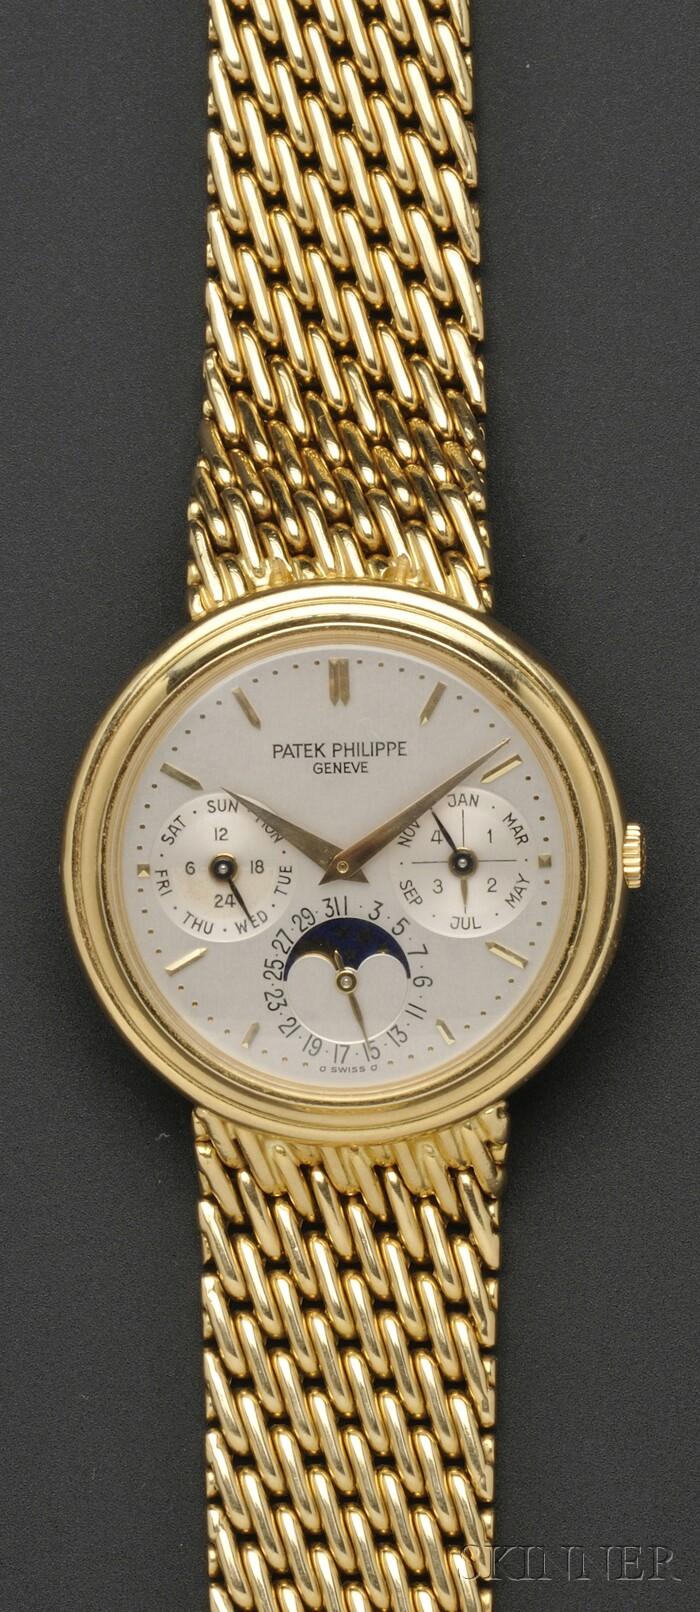 "18kt Gold ""Perpetual Calendar Moonphase"" Wristwatch, Patek Philippe"